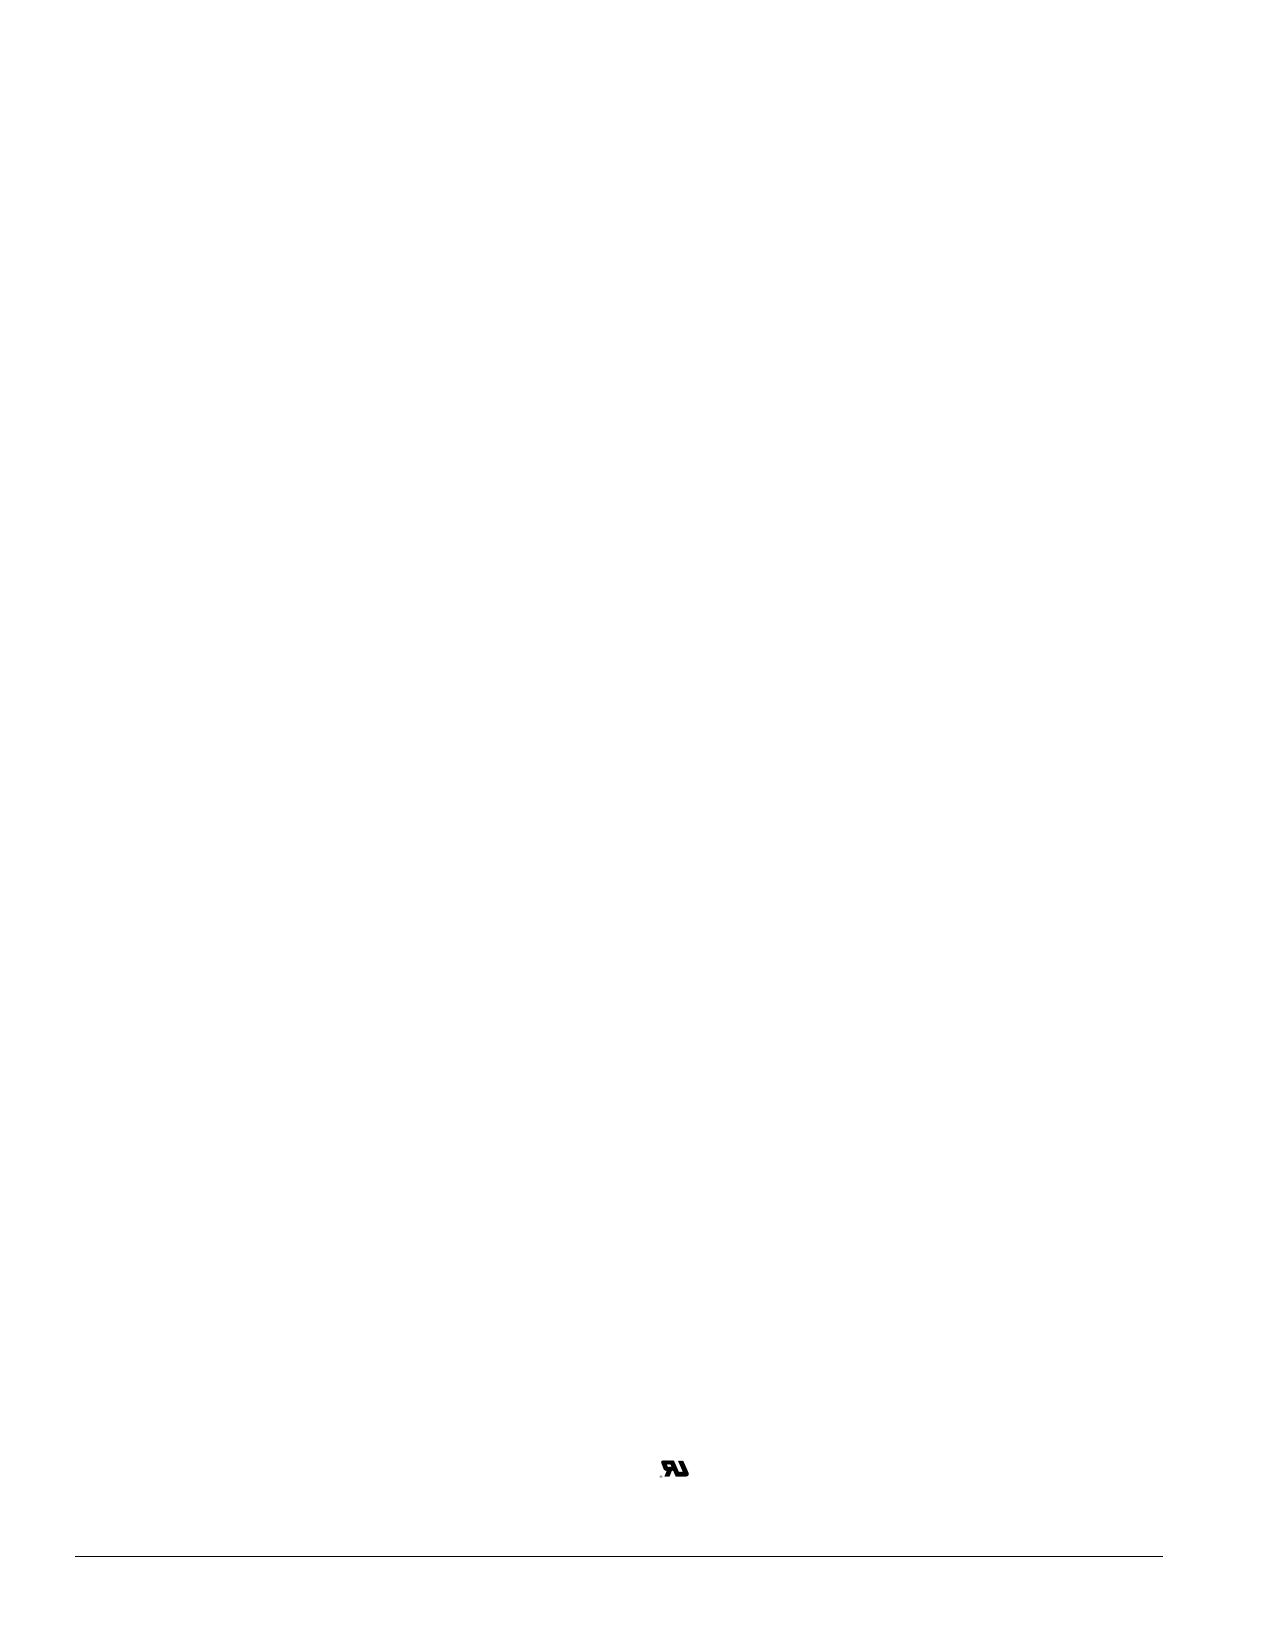 K1050G70 Даташит, Описание, Даташиты